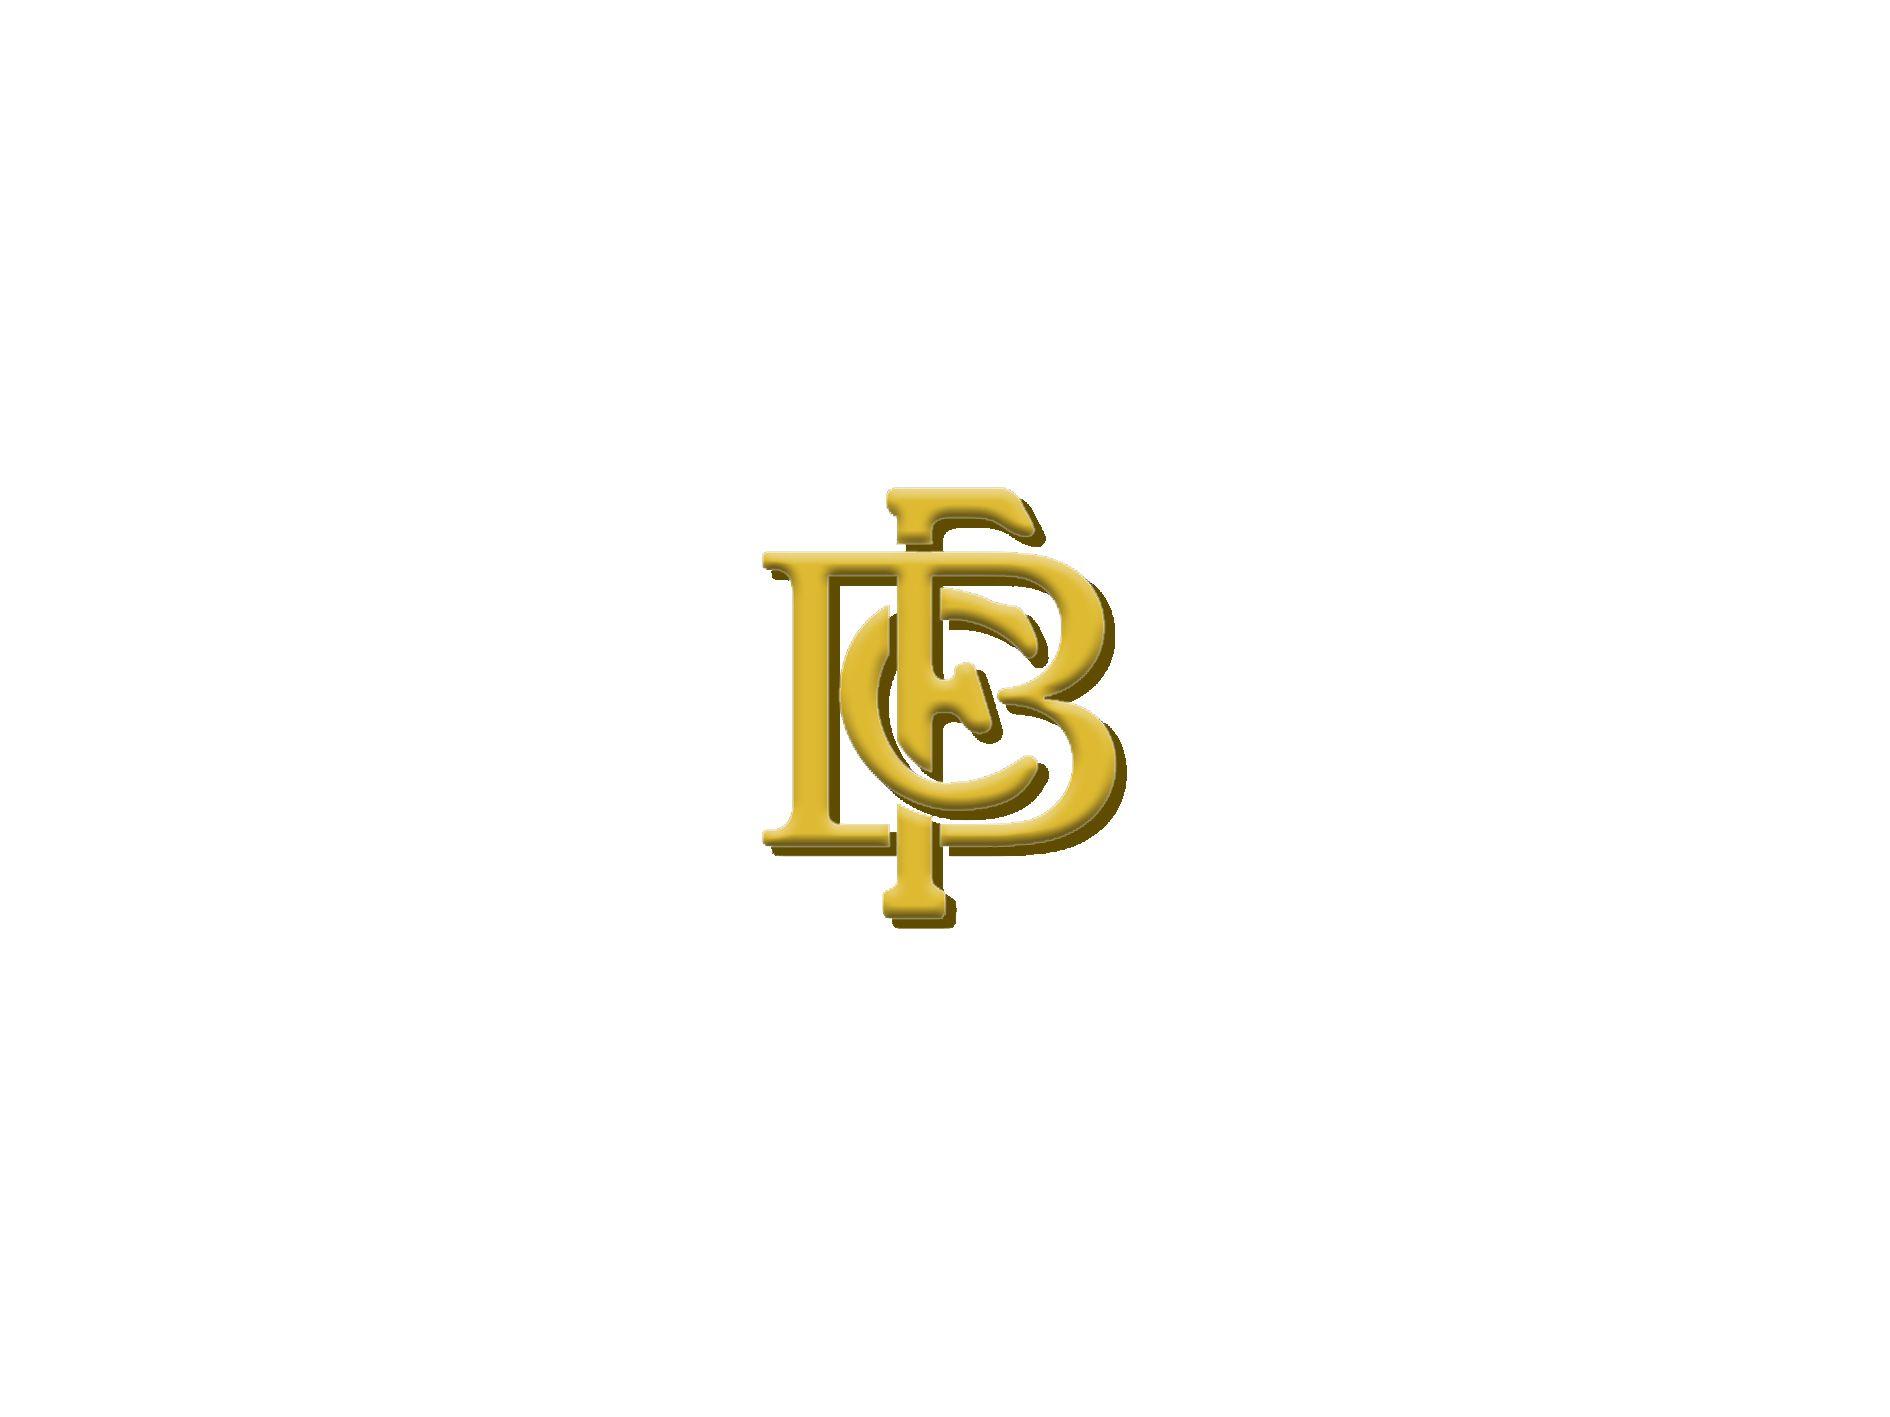 bend gold logo.jpg